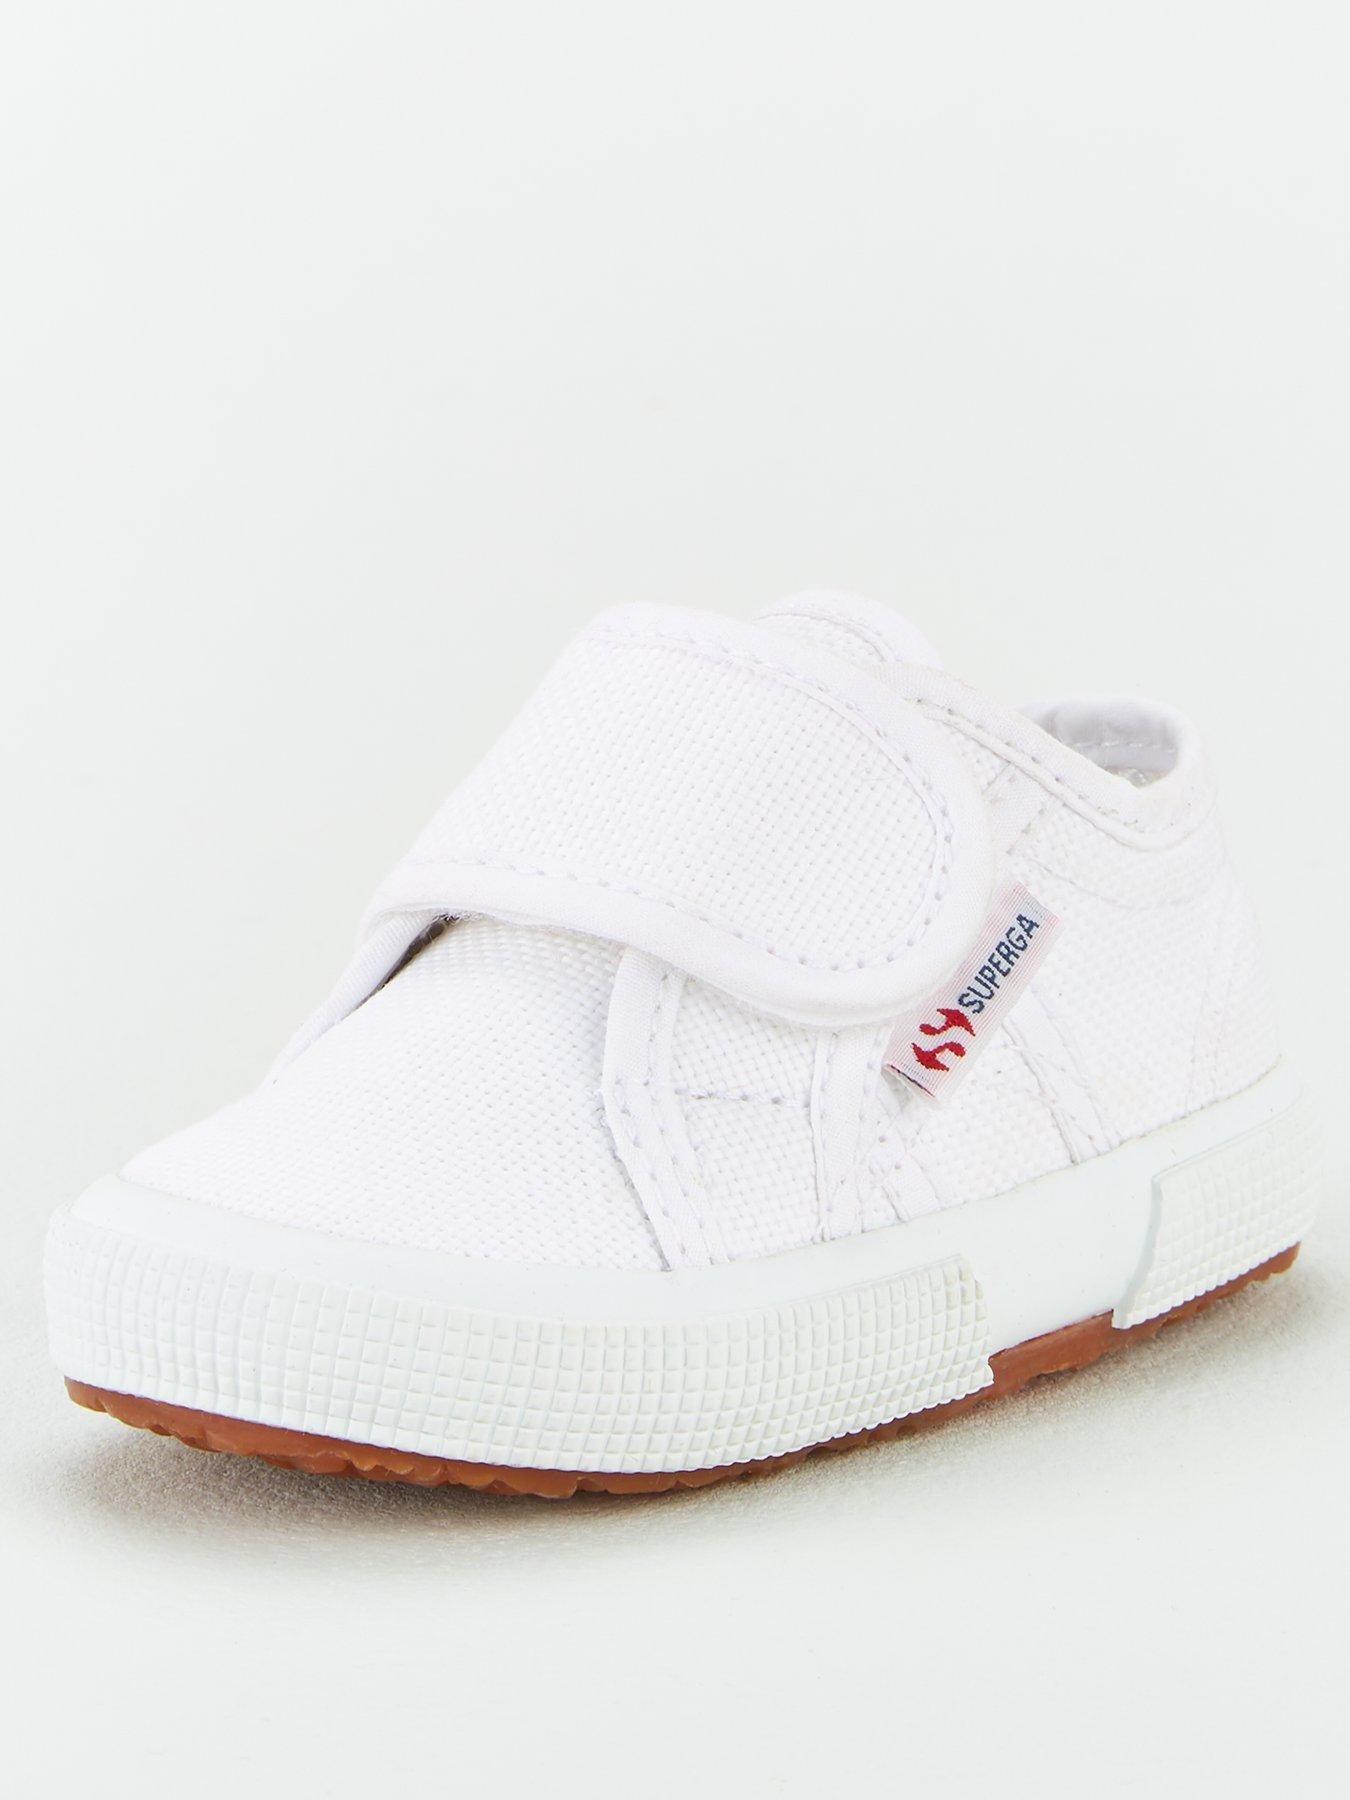 Plimsolls | Infant footwear (sizes